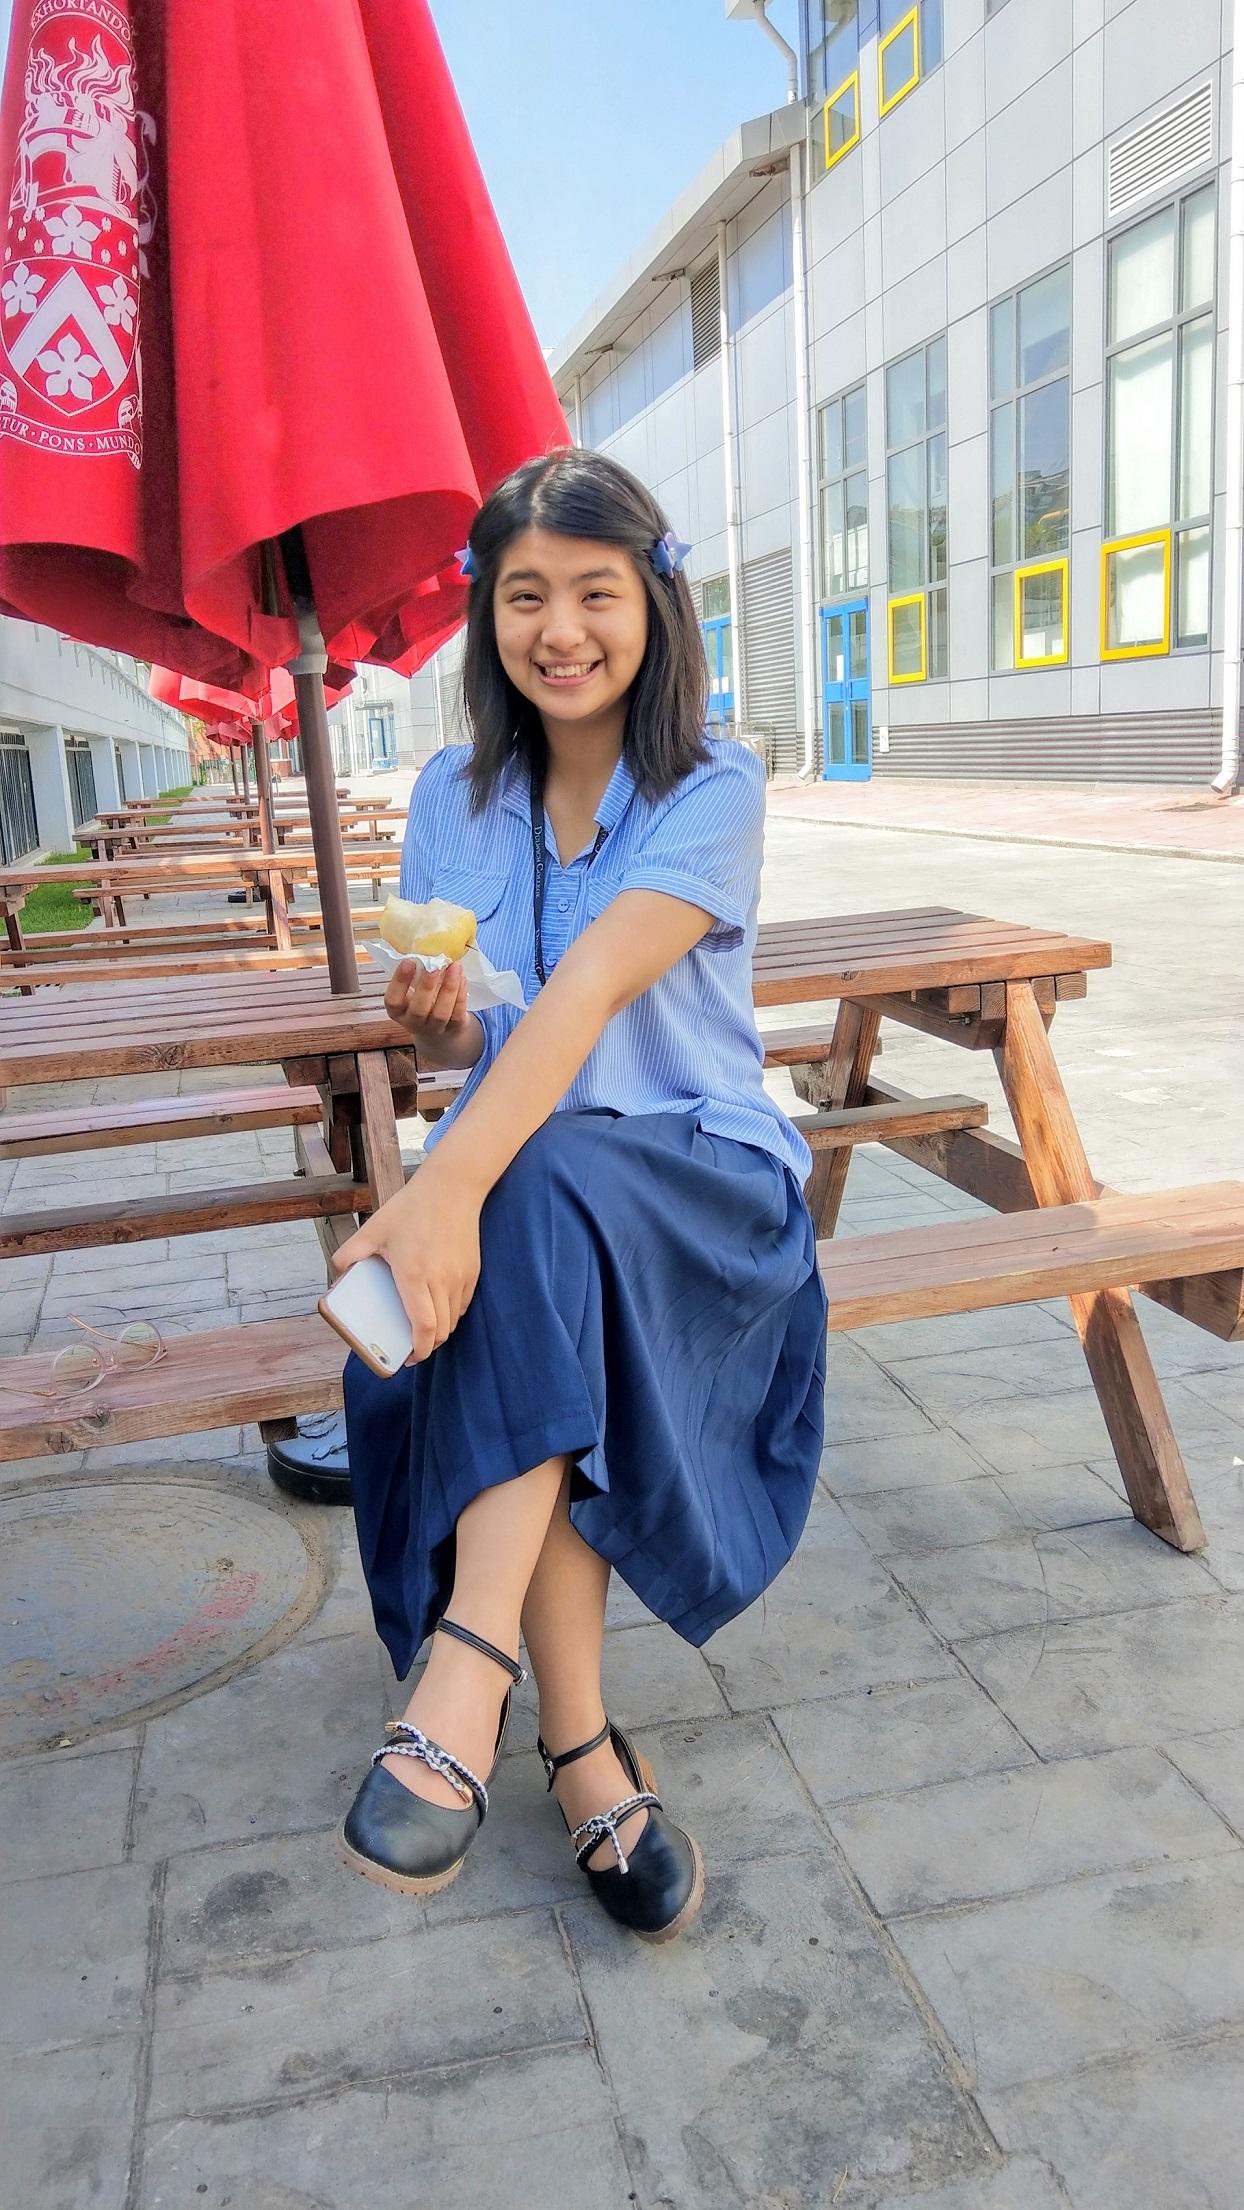 yiching-h-casualjpg-Dulwich_College_Beijing-20200609-161354-807